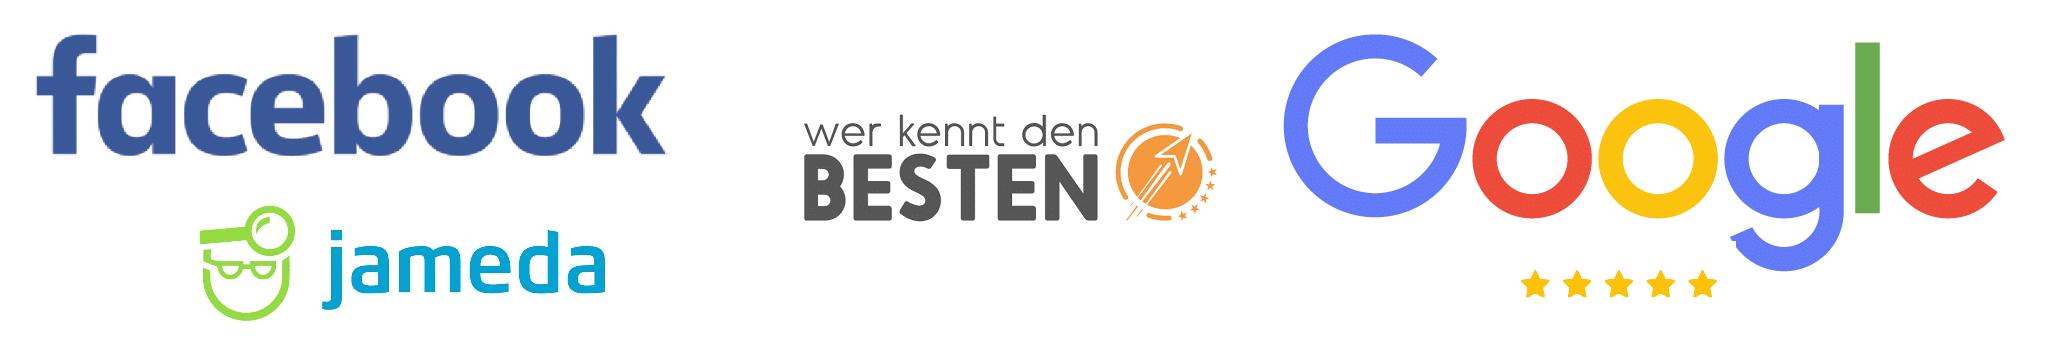 kd_responsive_logo